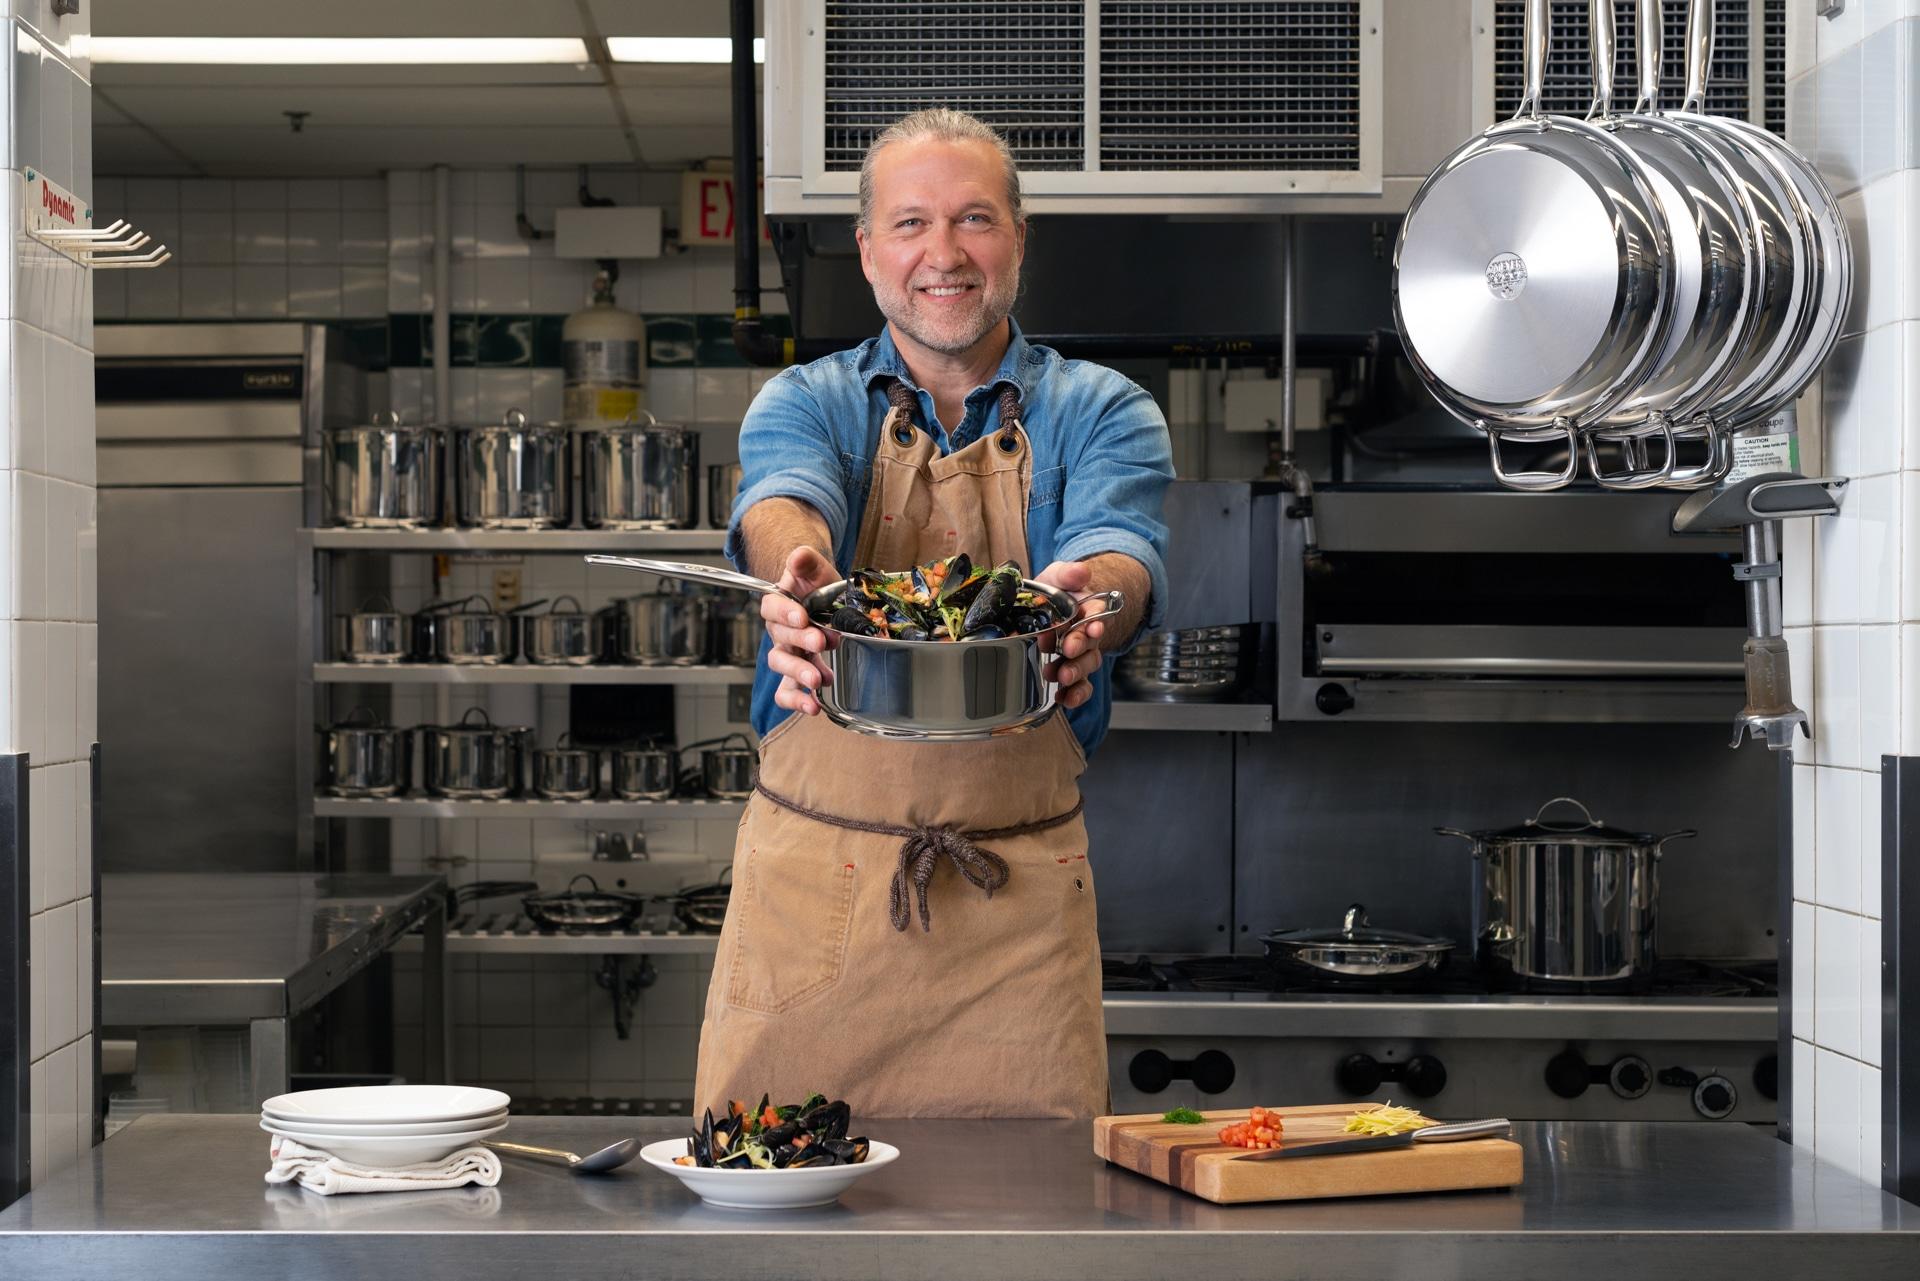 MEYER Chef Michael Smith